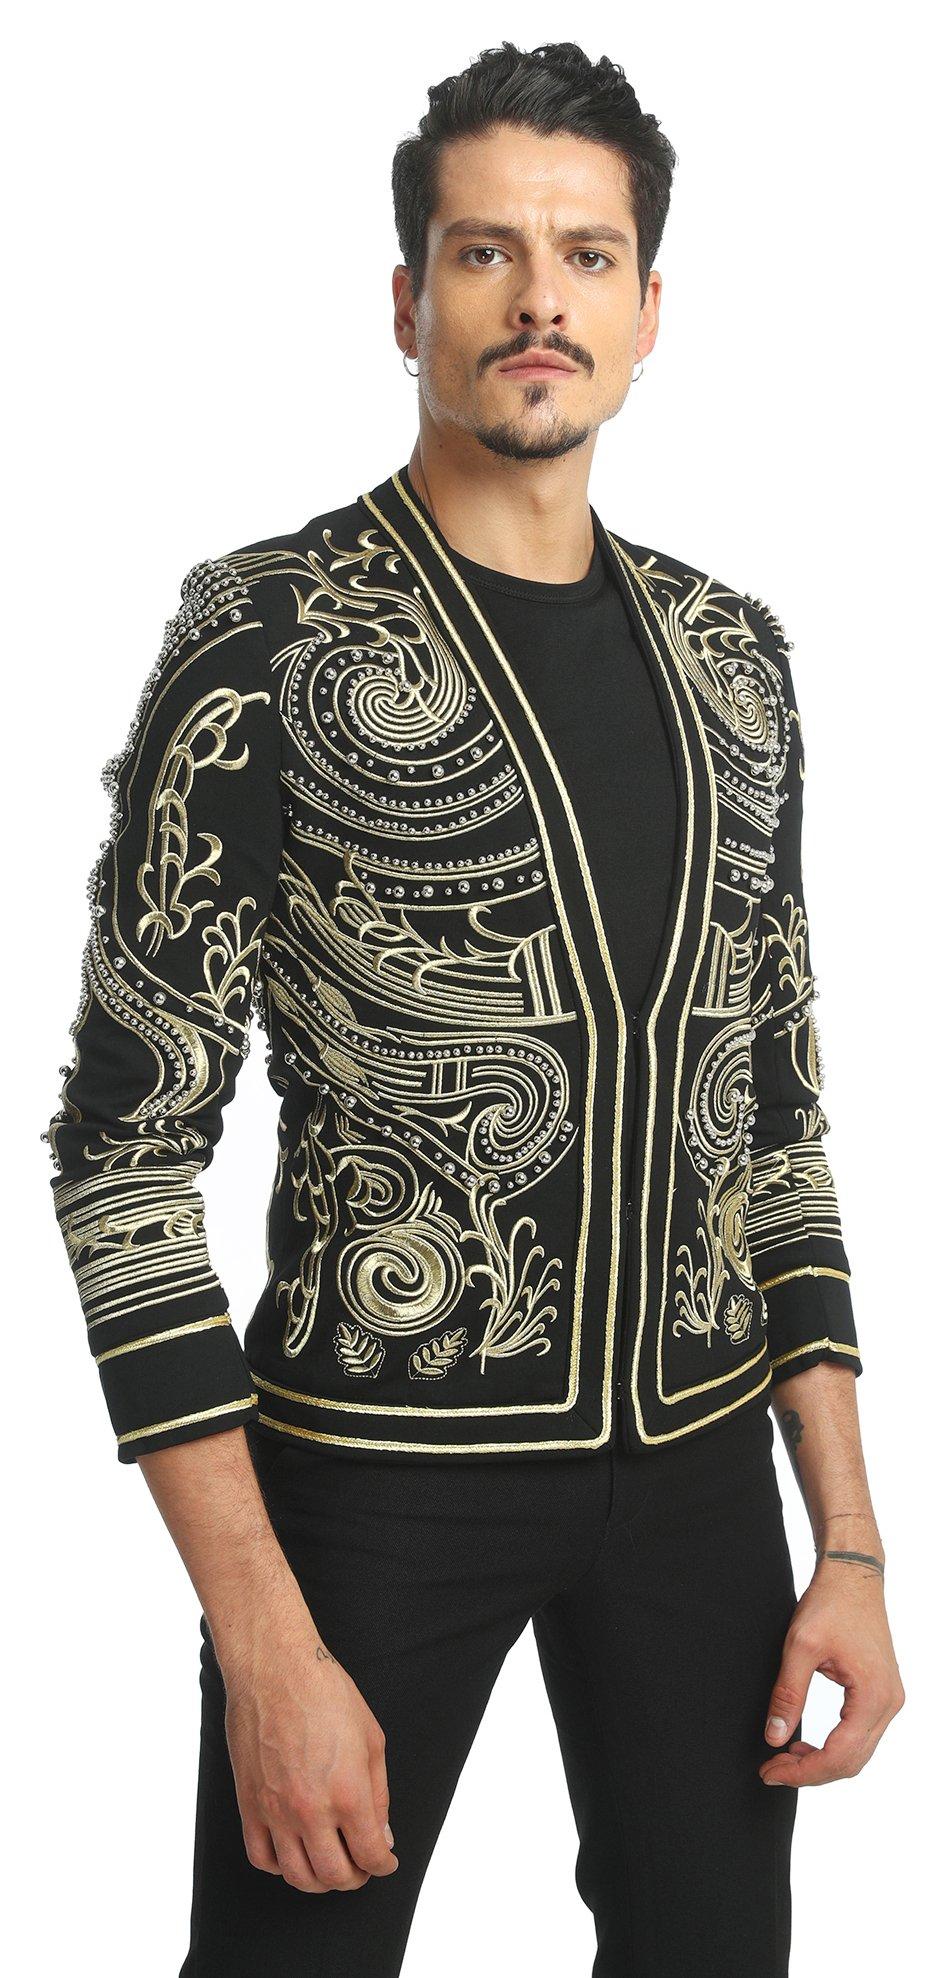 Pizoff Men's Luxury V-Neck Slim Fit Stylish Suit Blazer Jacket Long Sleeve Formal Dinner Dress AD001-02-L by Pizoff (Image #2)